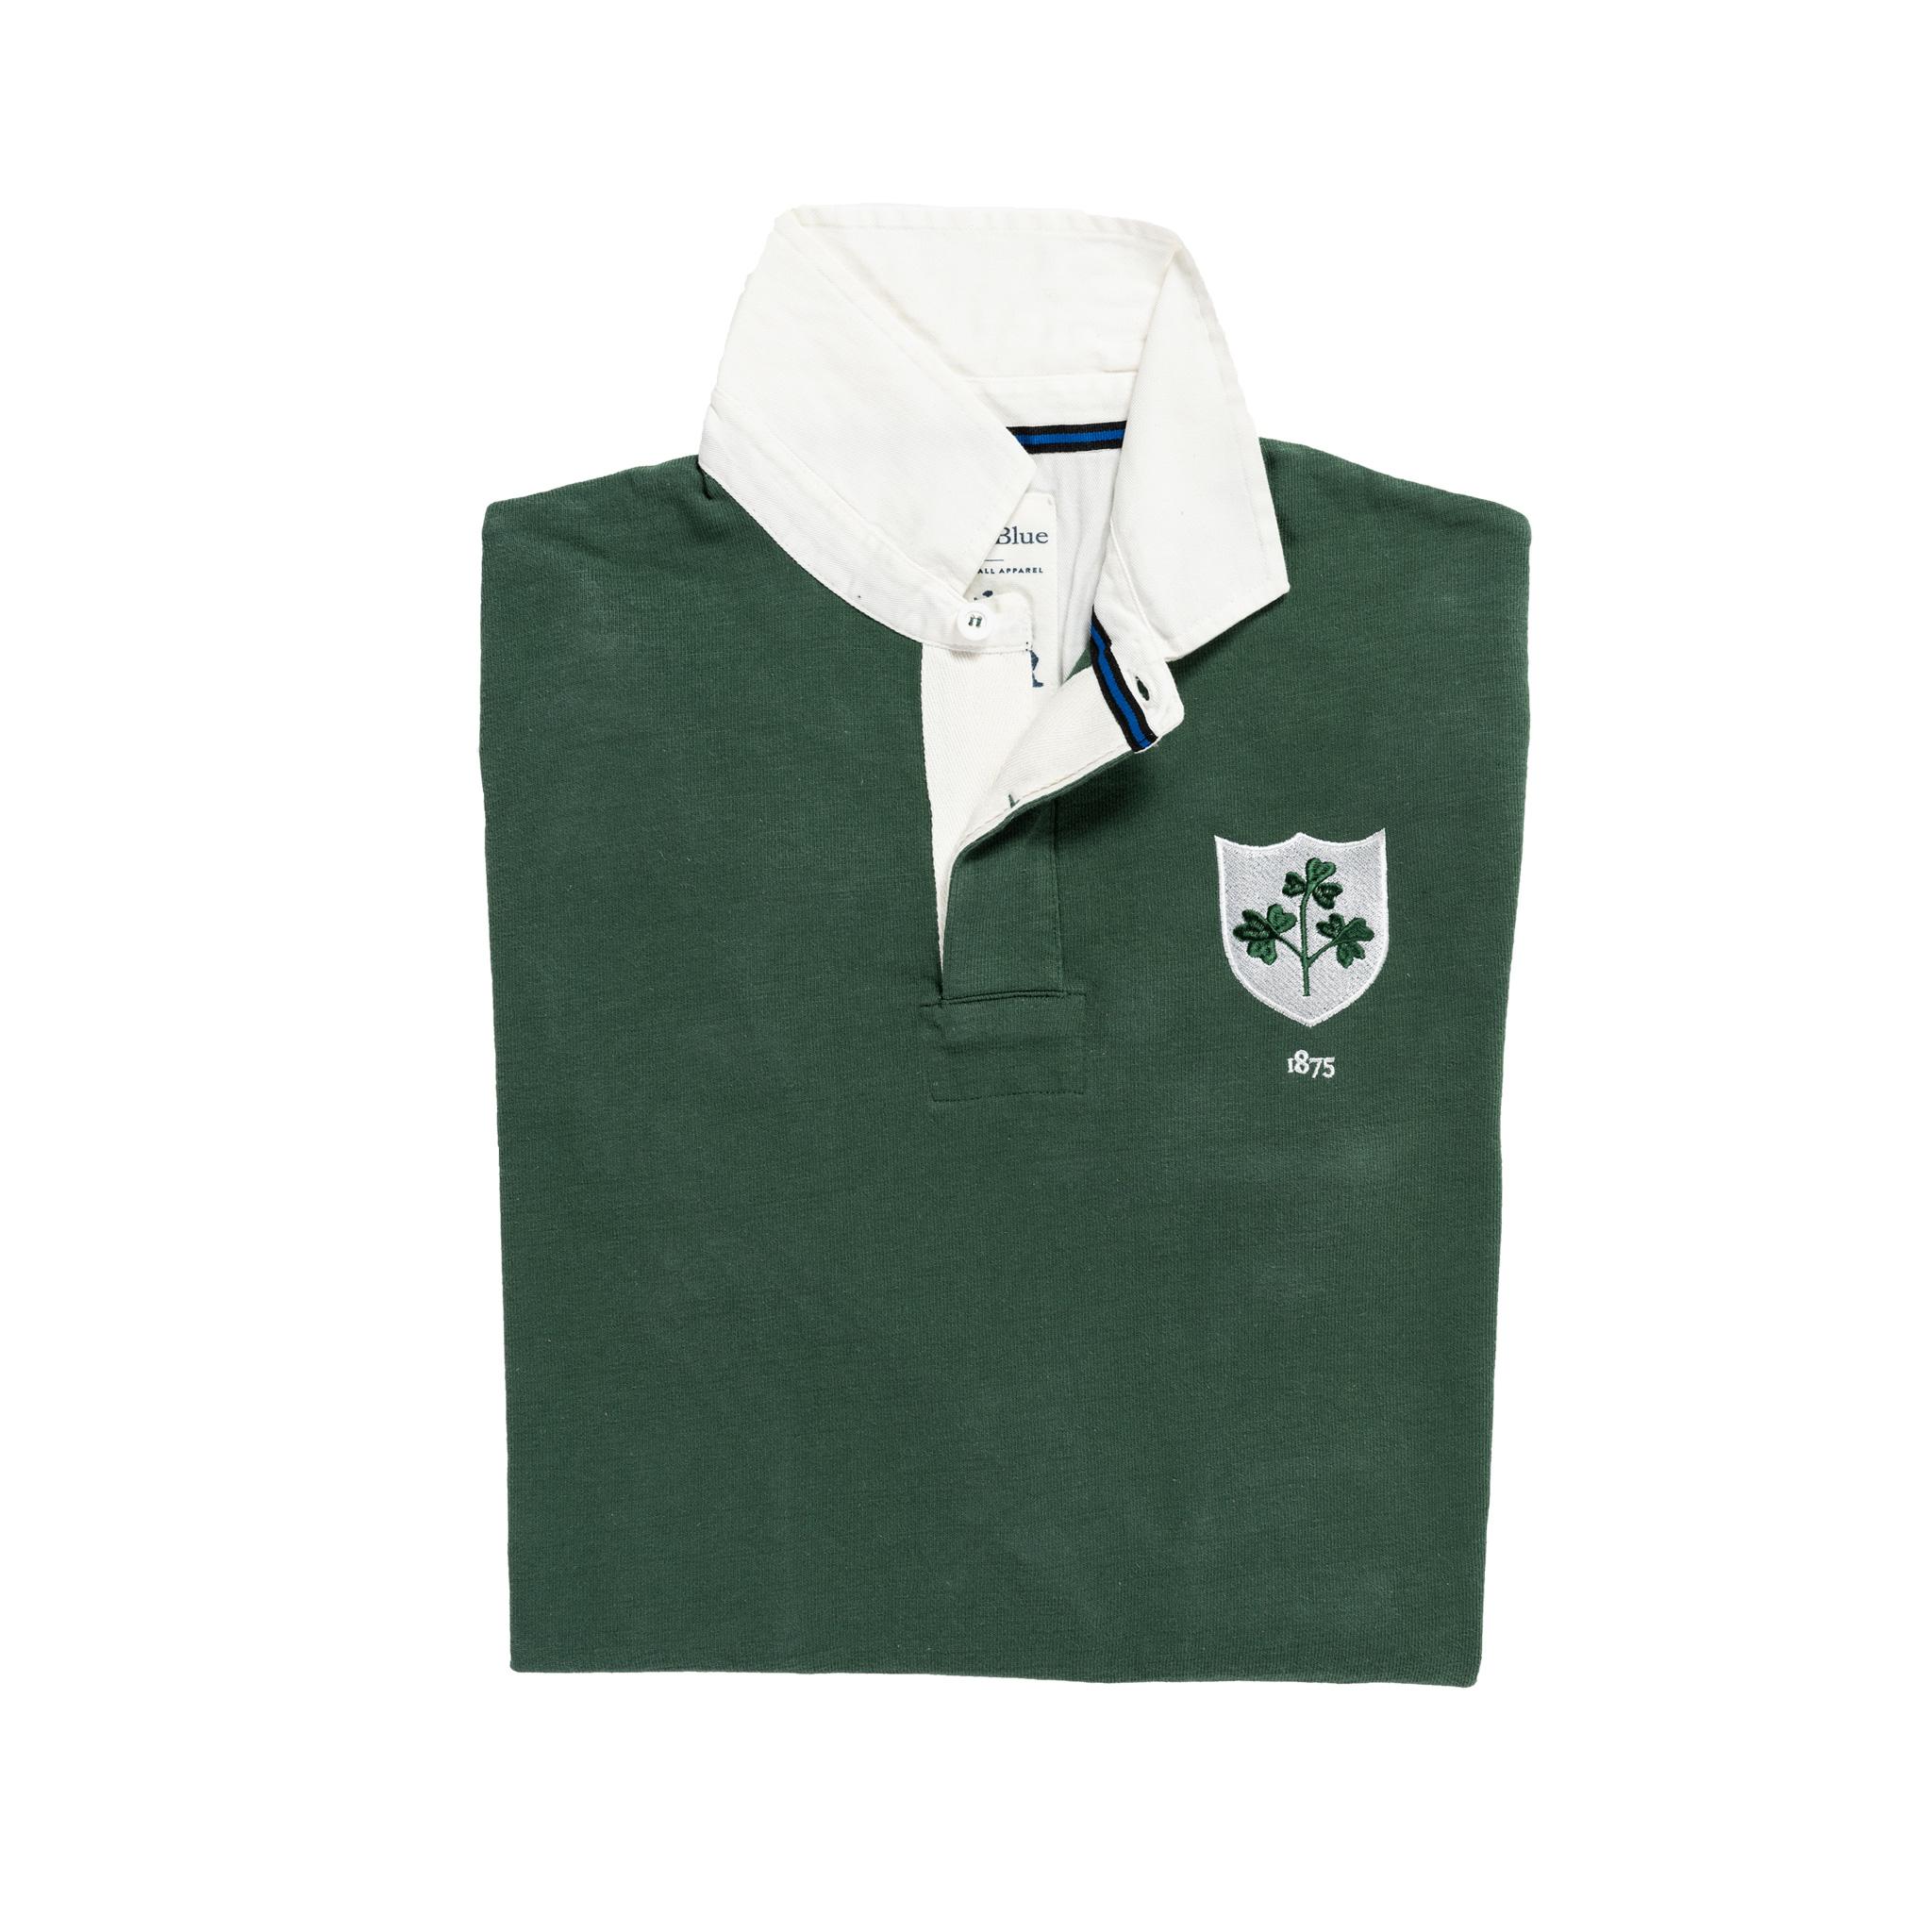 Ireland 1875 Vintage Rugby Shirt